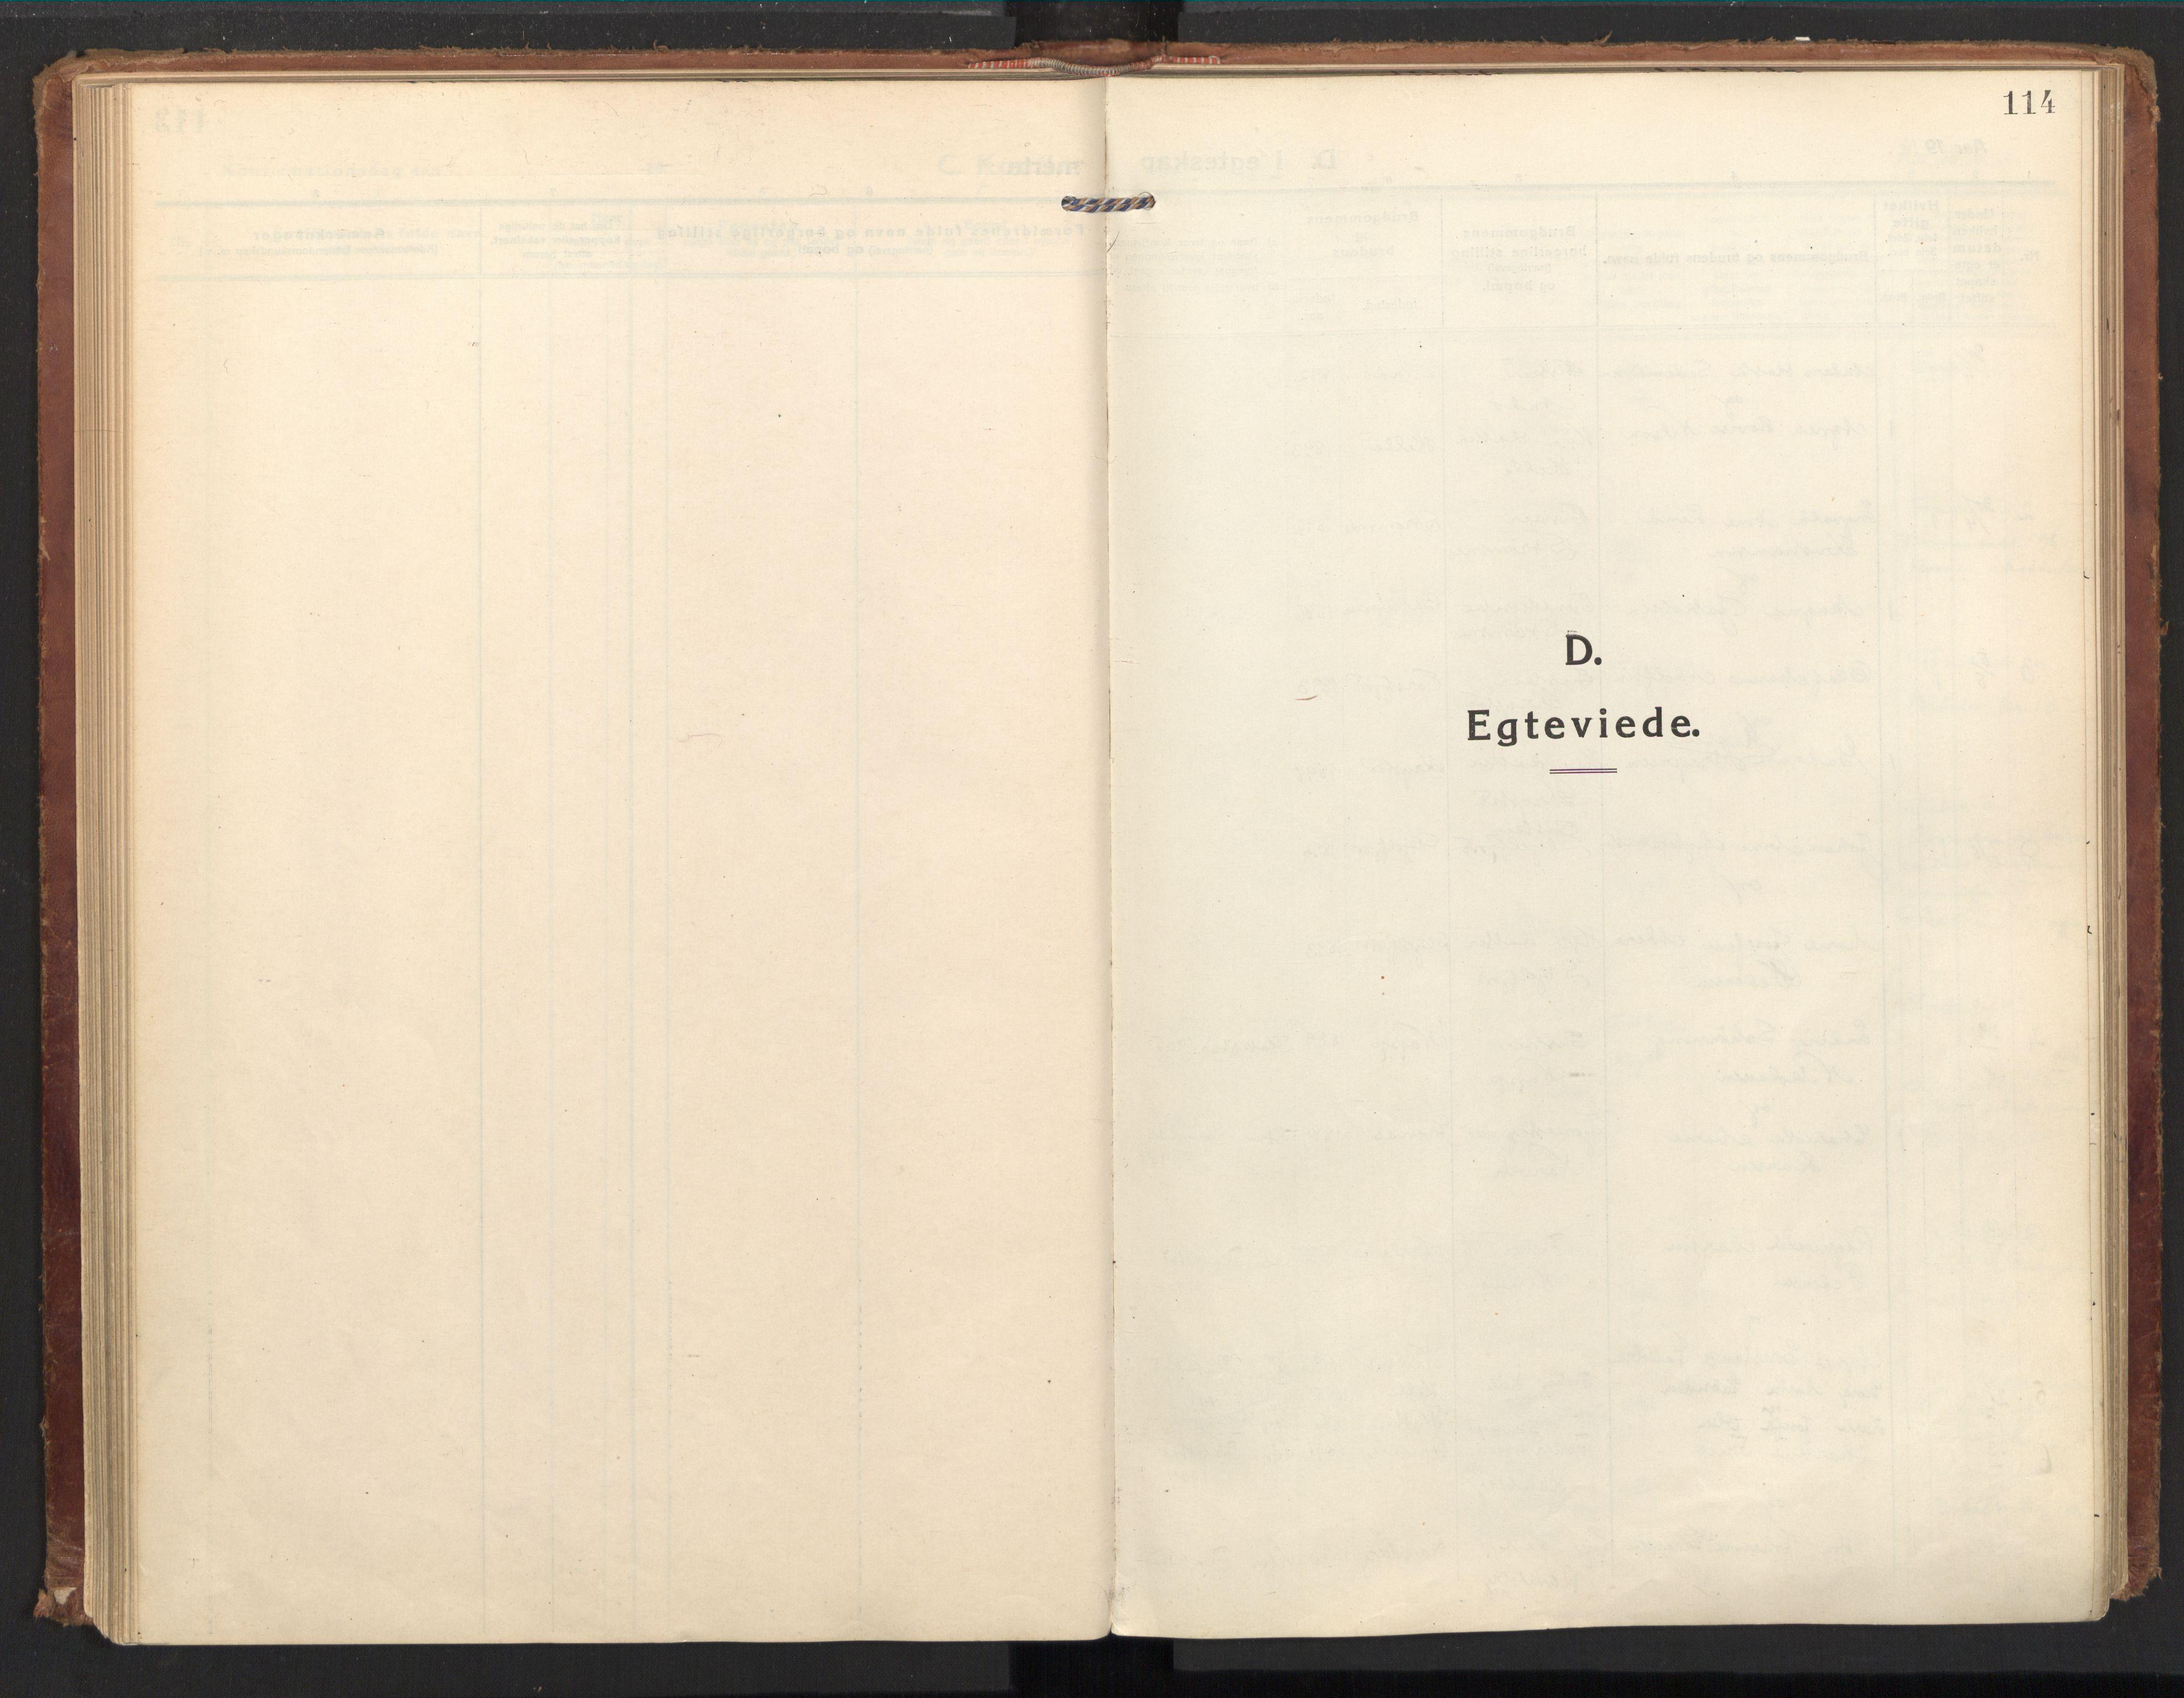 SAT, Ministerialprotokoller, klokkerbøker og fødselsregistre - Nordland, 885/L1210: Ministerialbok nr. 885A10, 1916-1926, s. 114